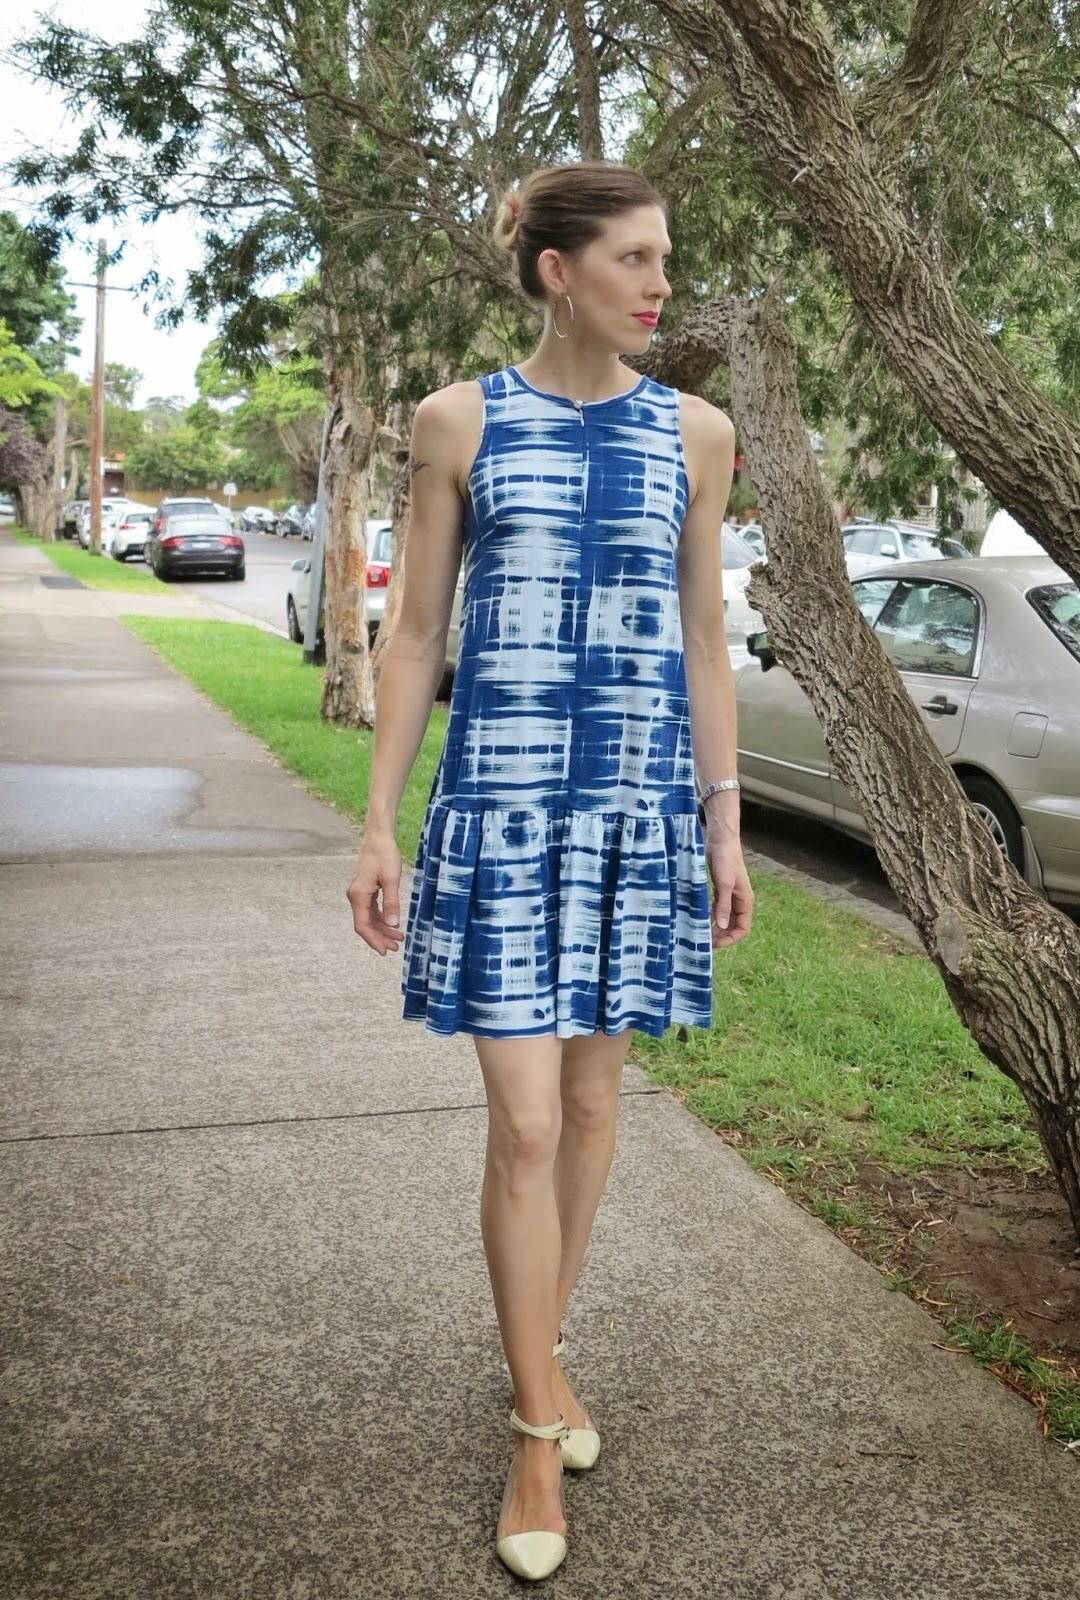 http://lilysageandco.blogspot.com/2013/12/drop-waist-obsession.html